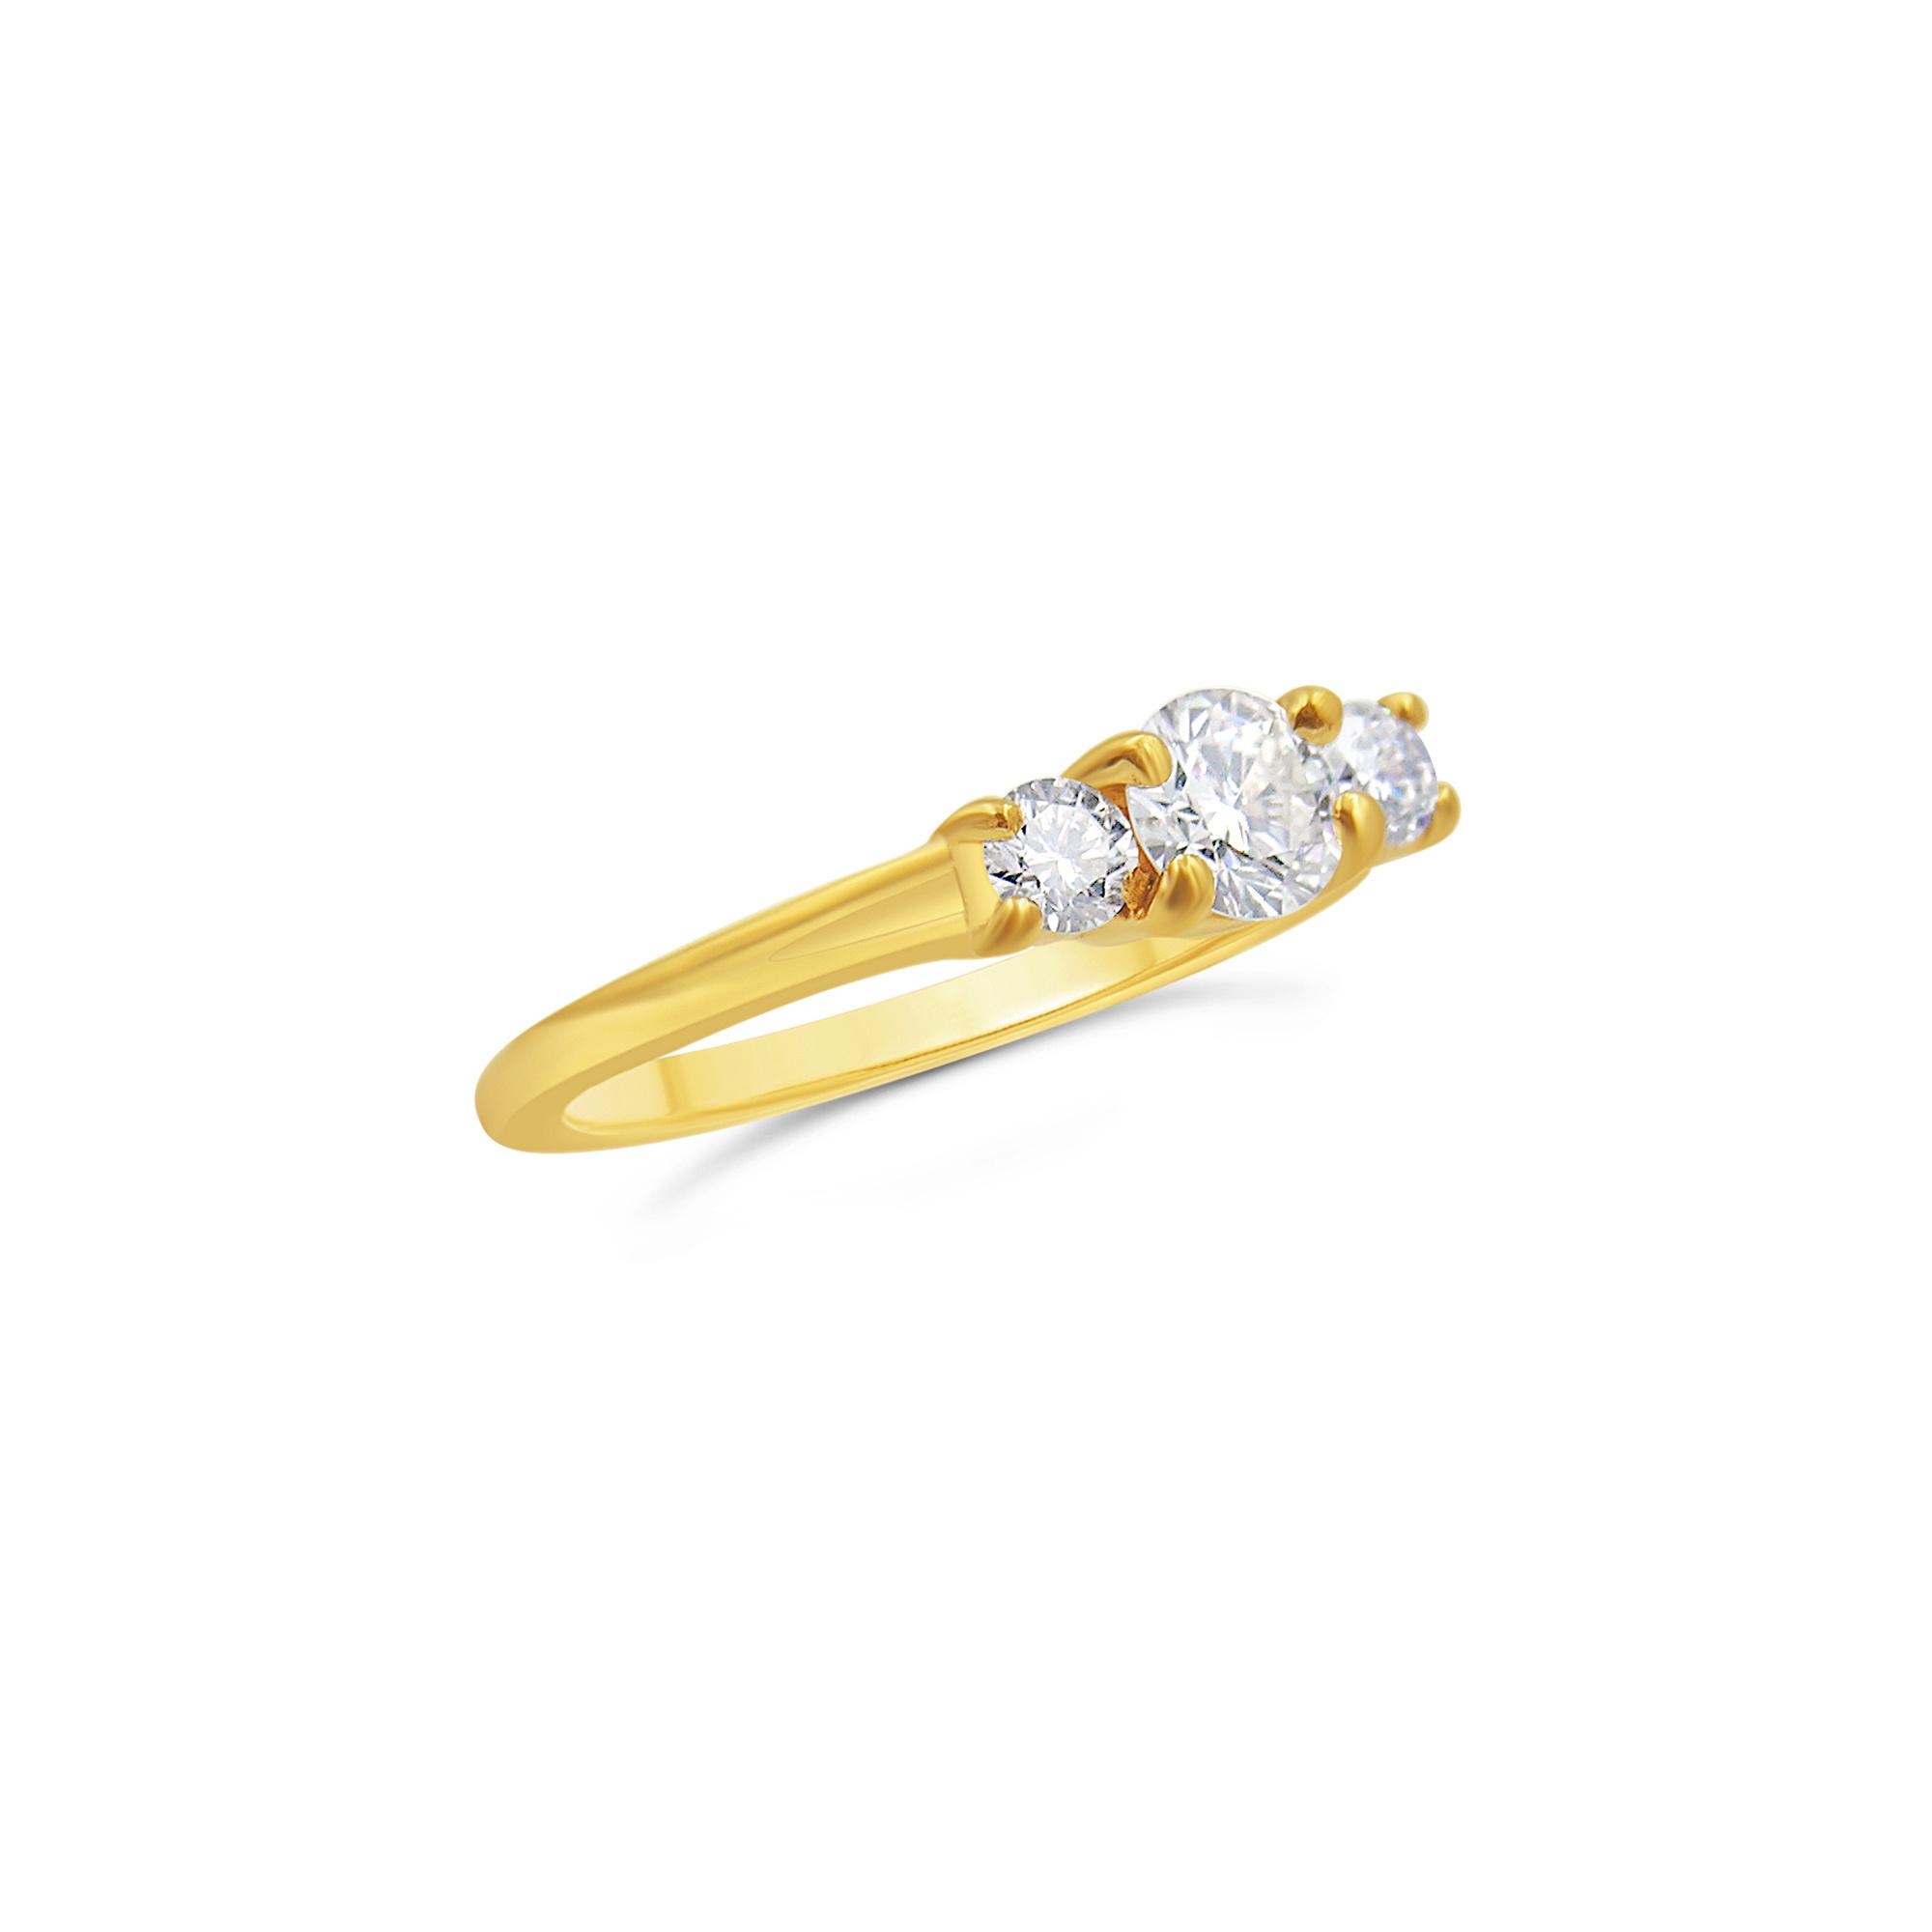 18kt geel goud trielogie verlovingsring met 0.64 ct diamanten